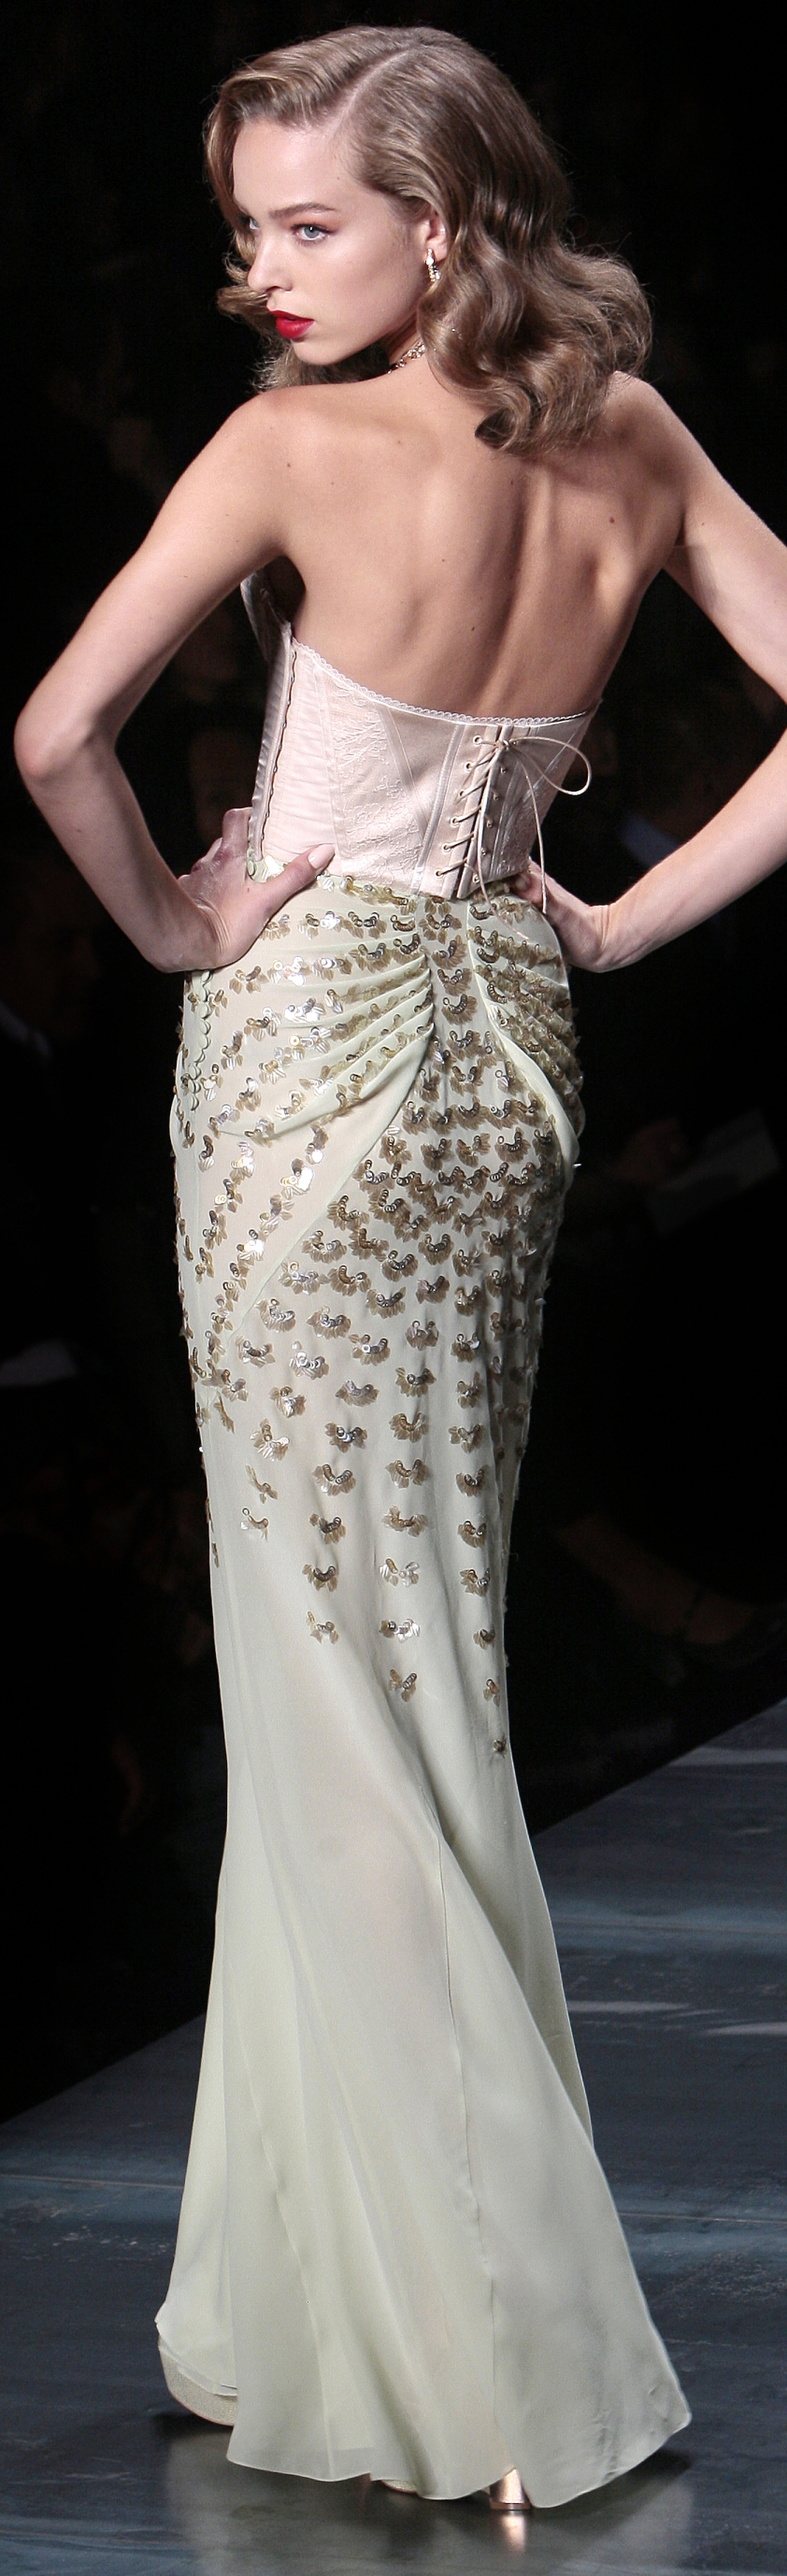 Dior SS10 09 detail